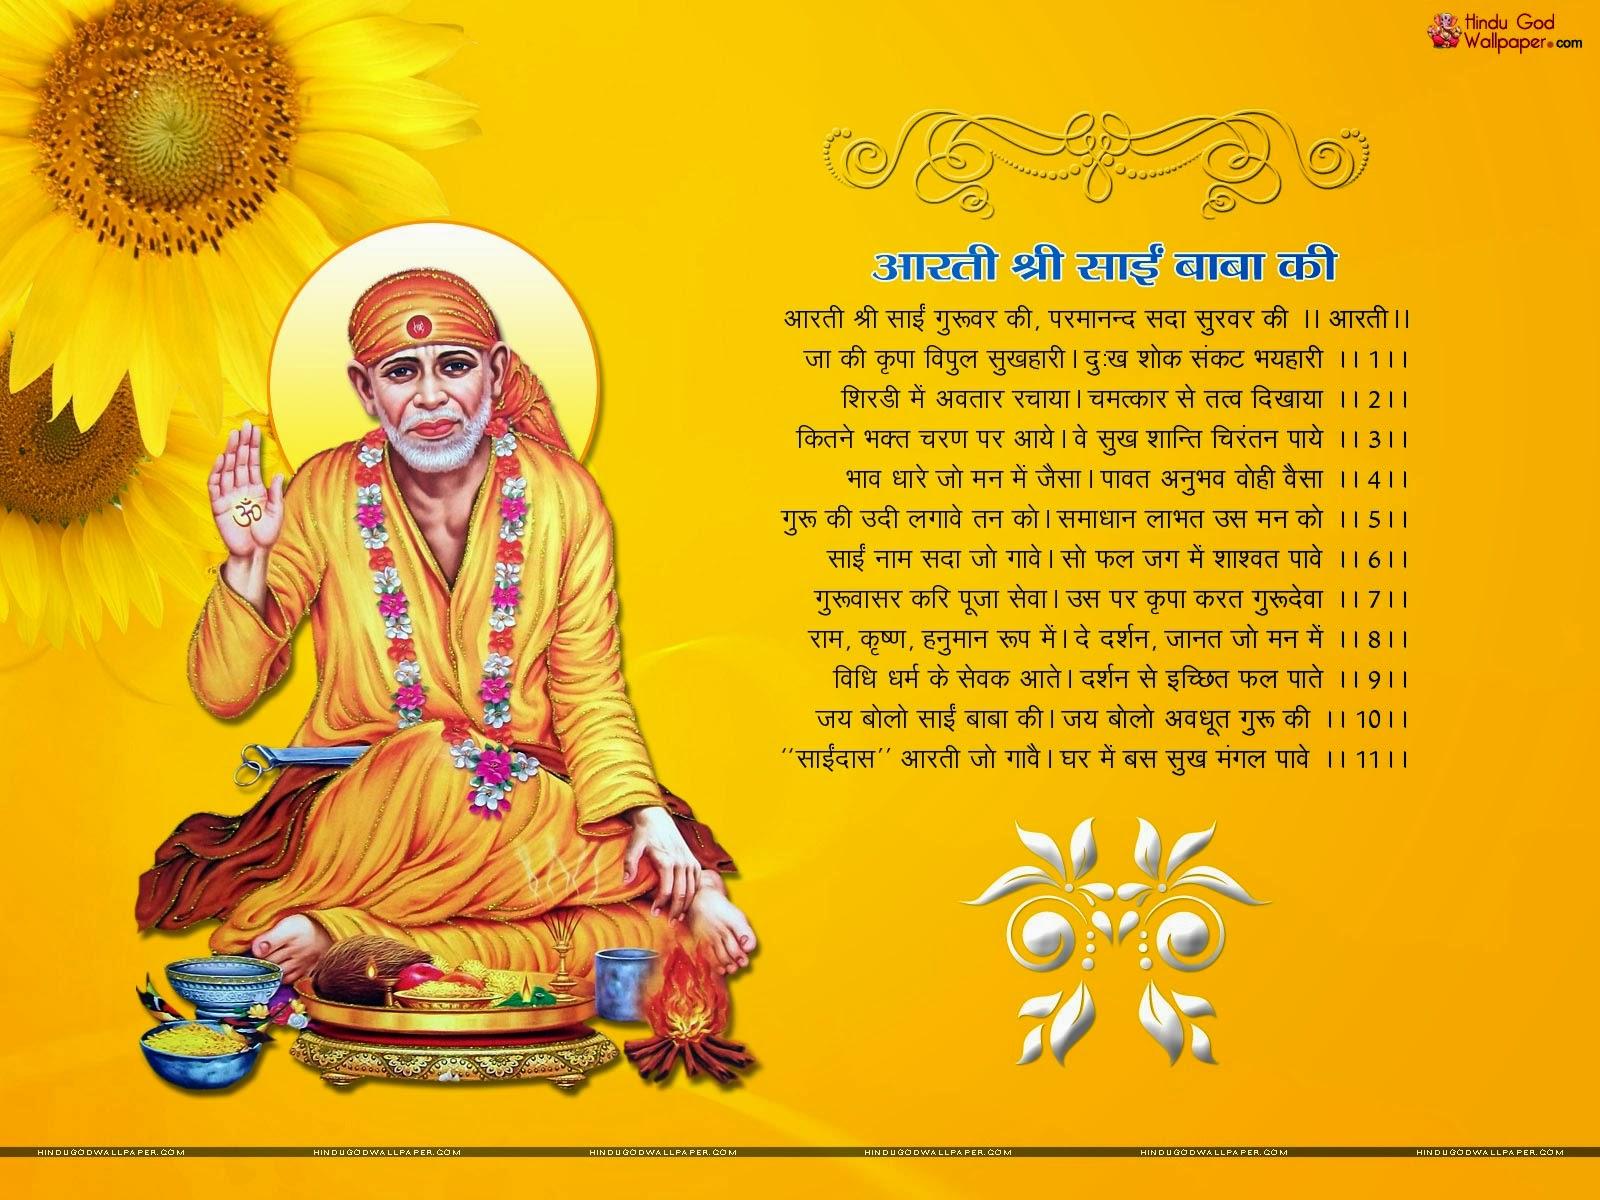 shiva trilogy in gujarati pdf free download